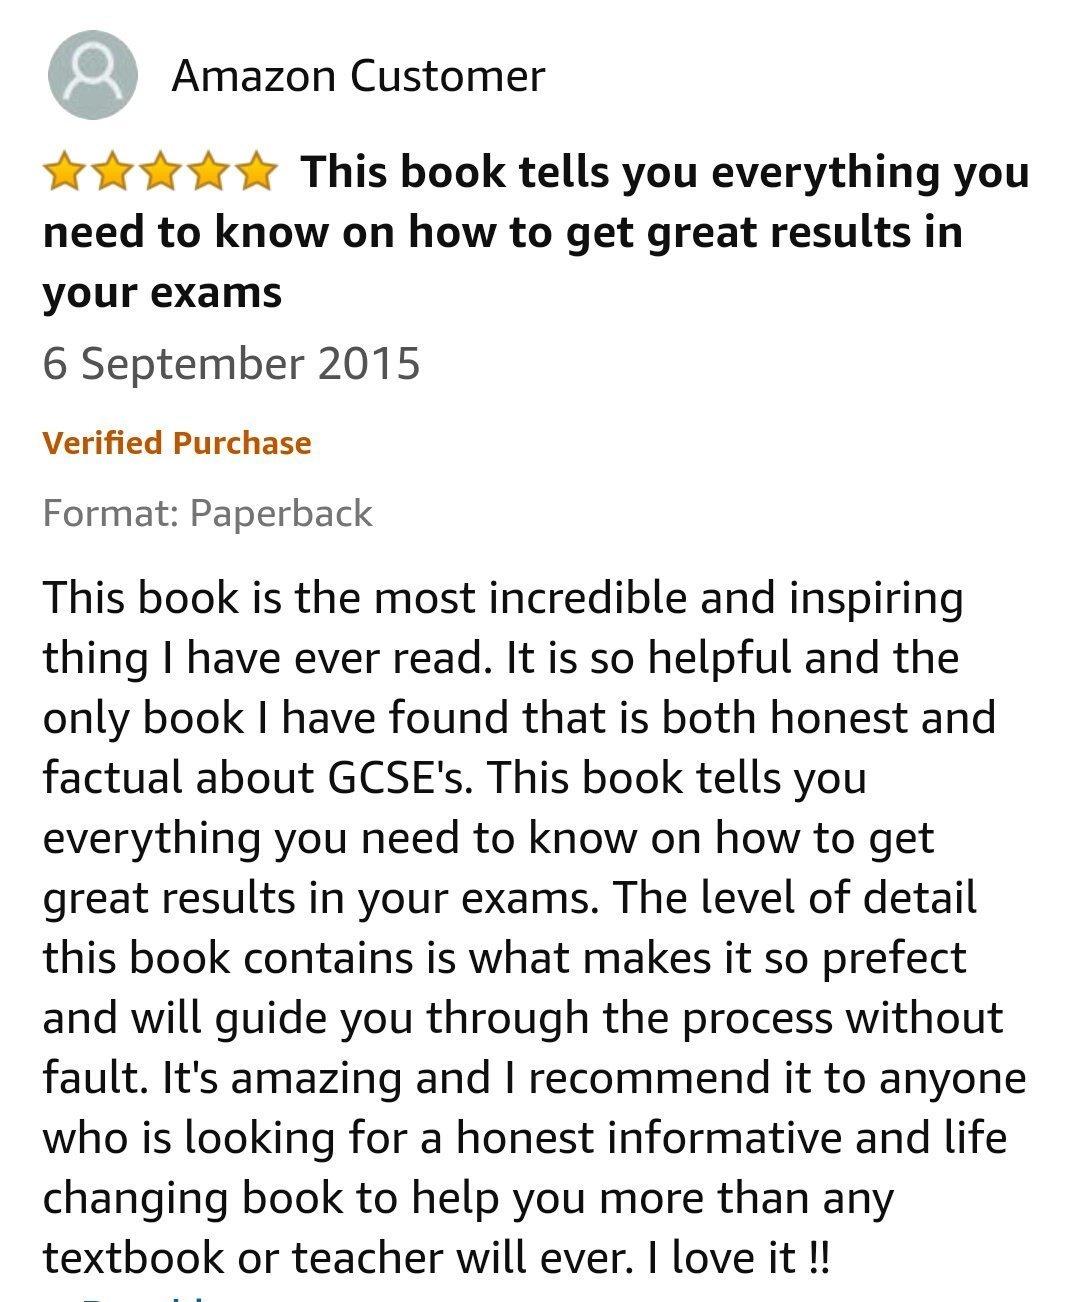 GCSE Reviews 75